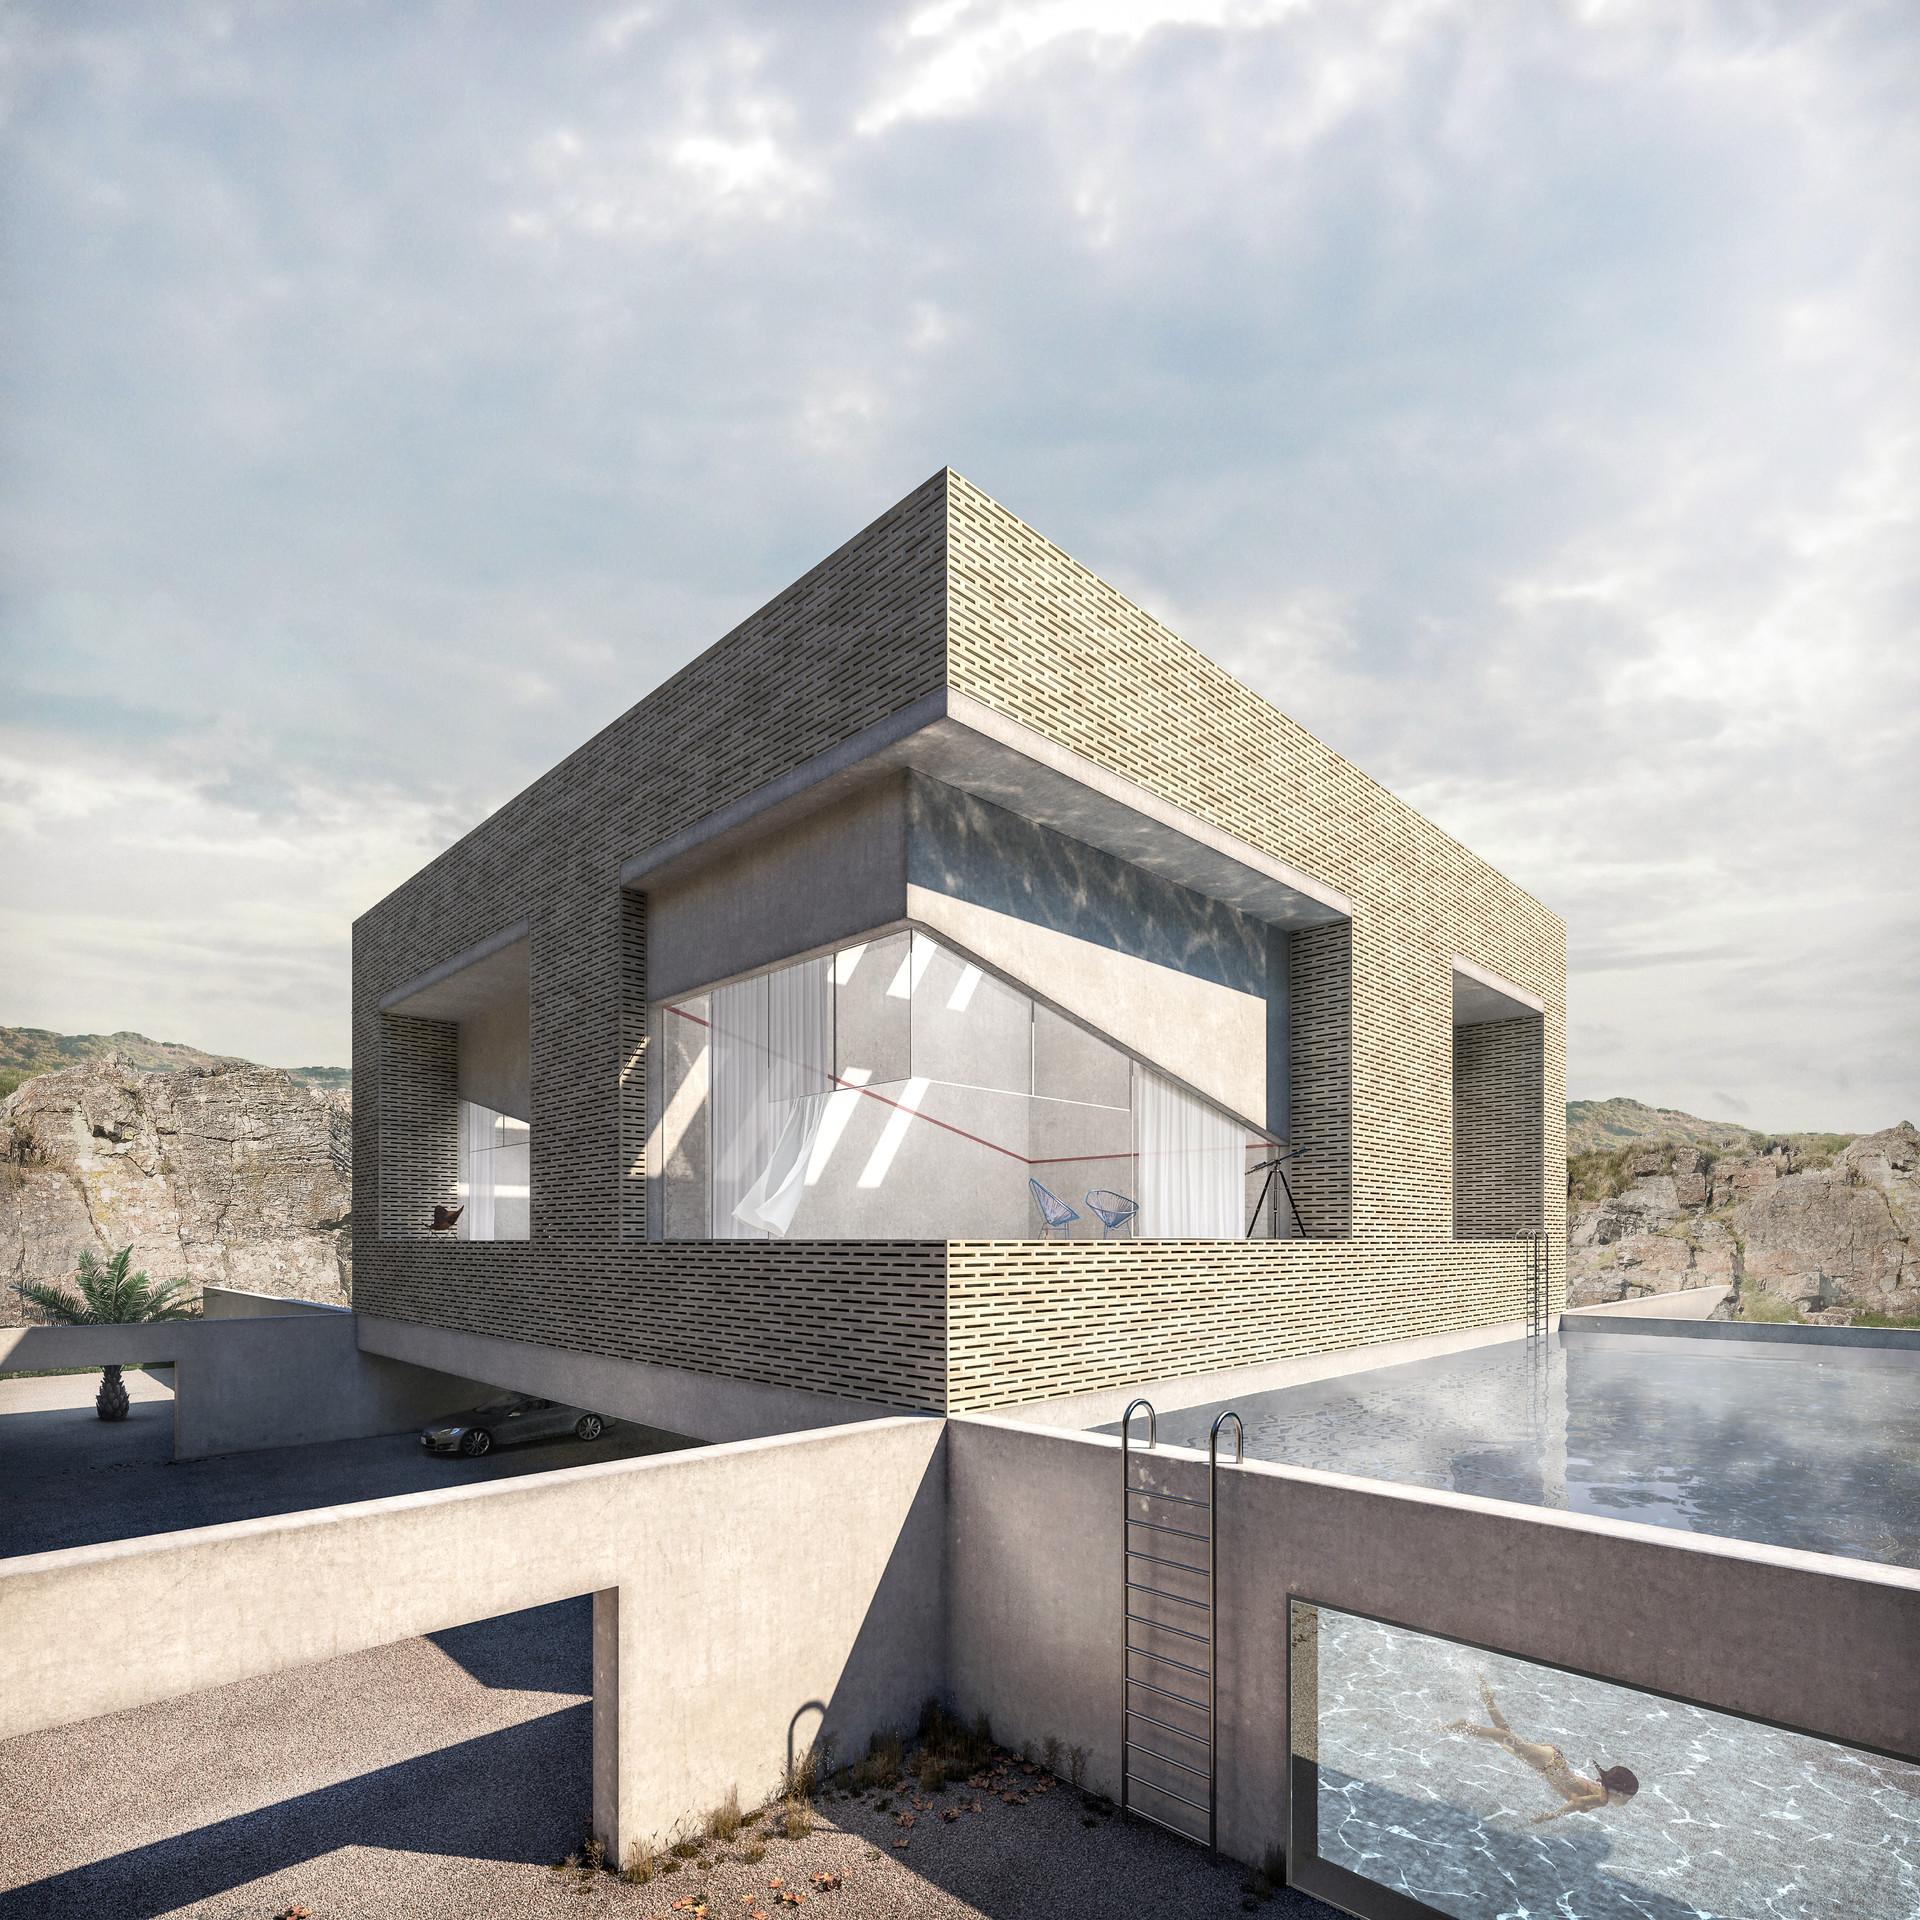 Play time architectonic image toi t squash house 01